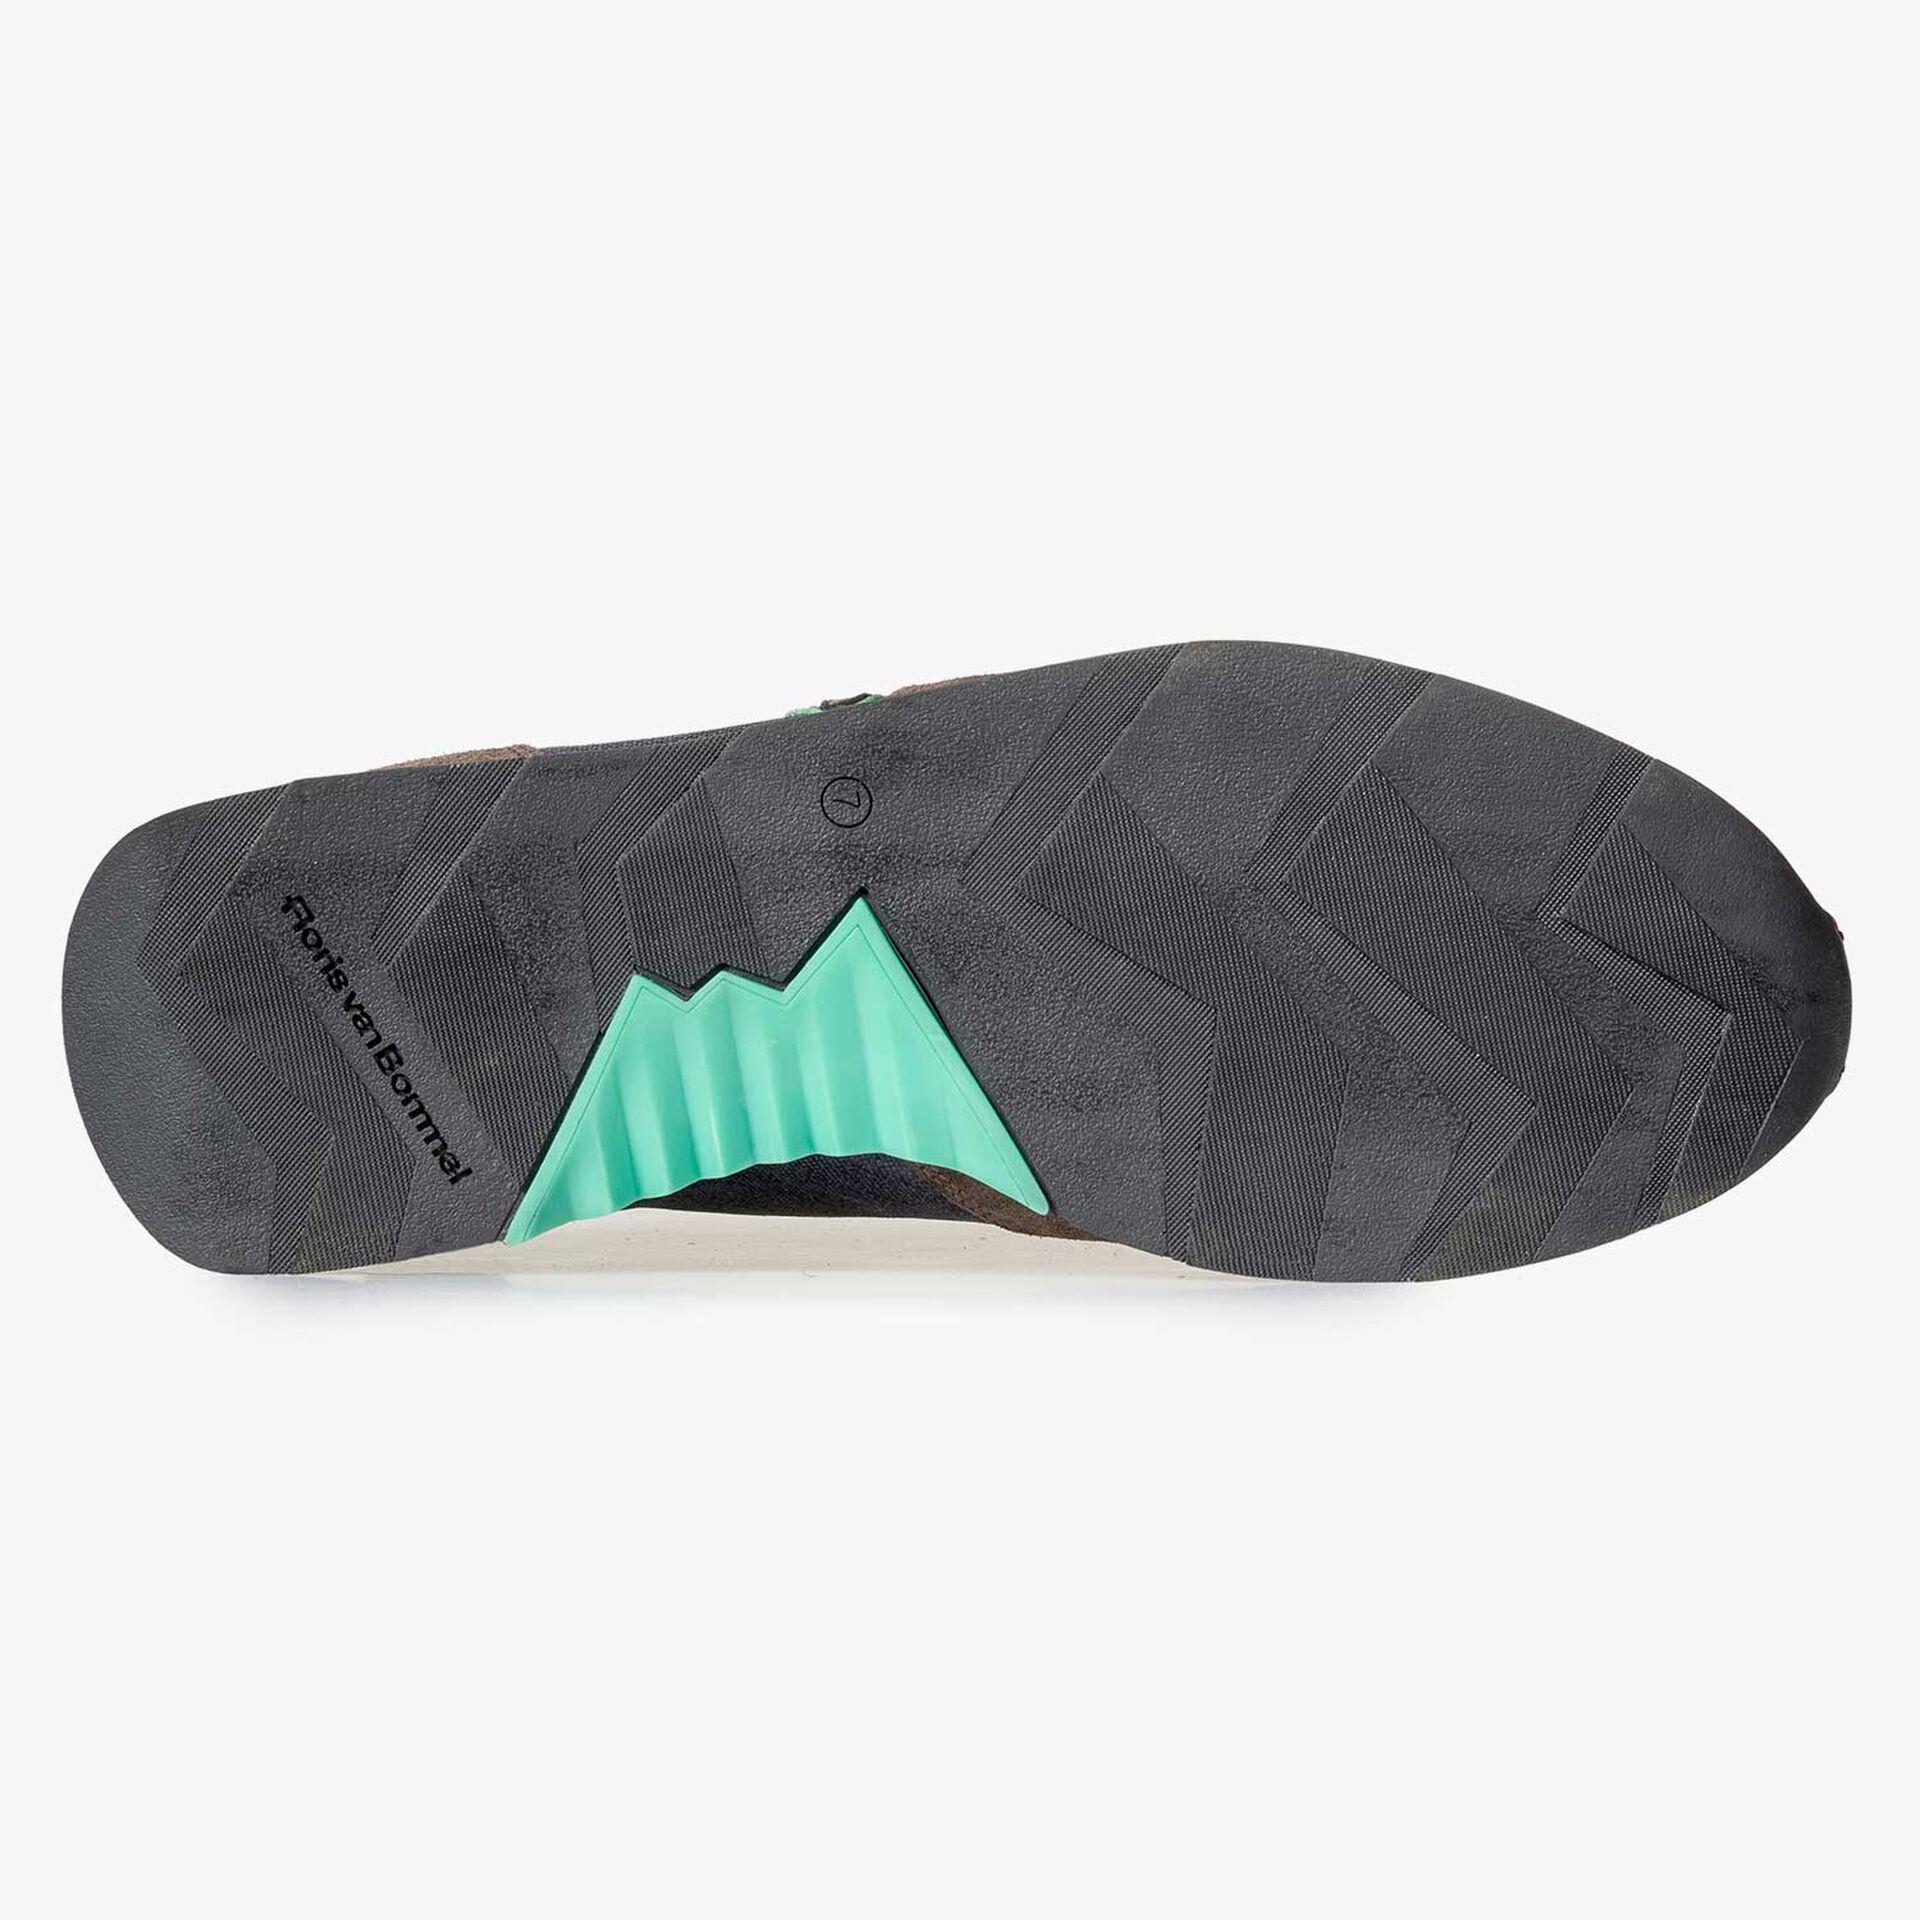 Blauer/ Grüner Leinen Sneaker mit grünen Akzenten